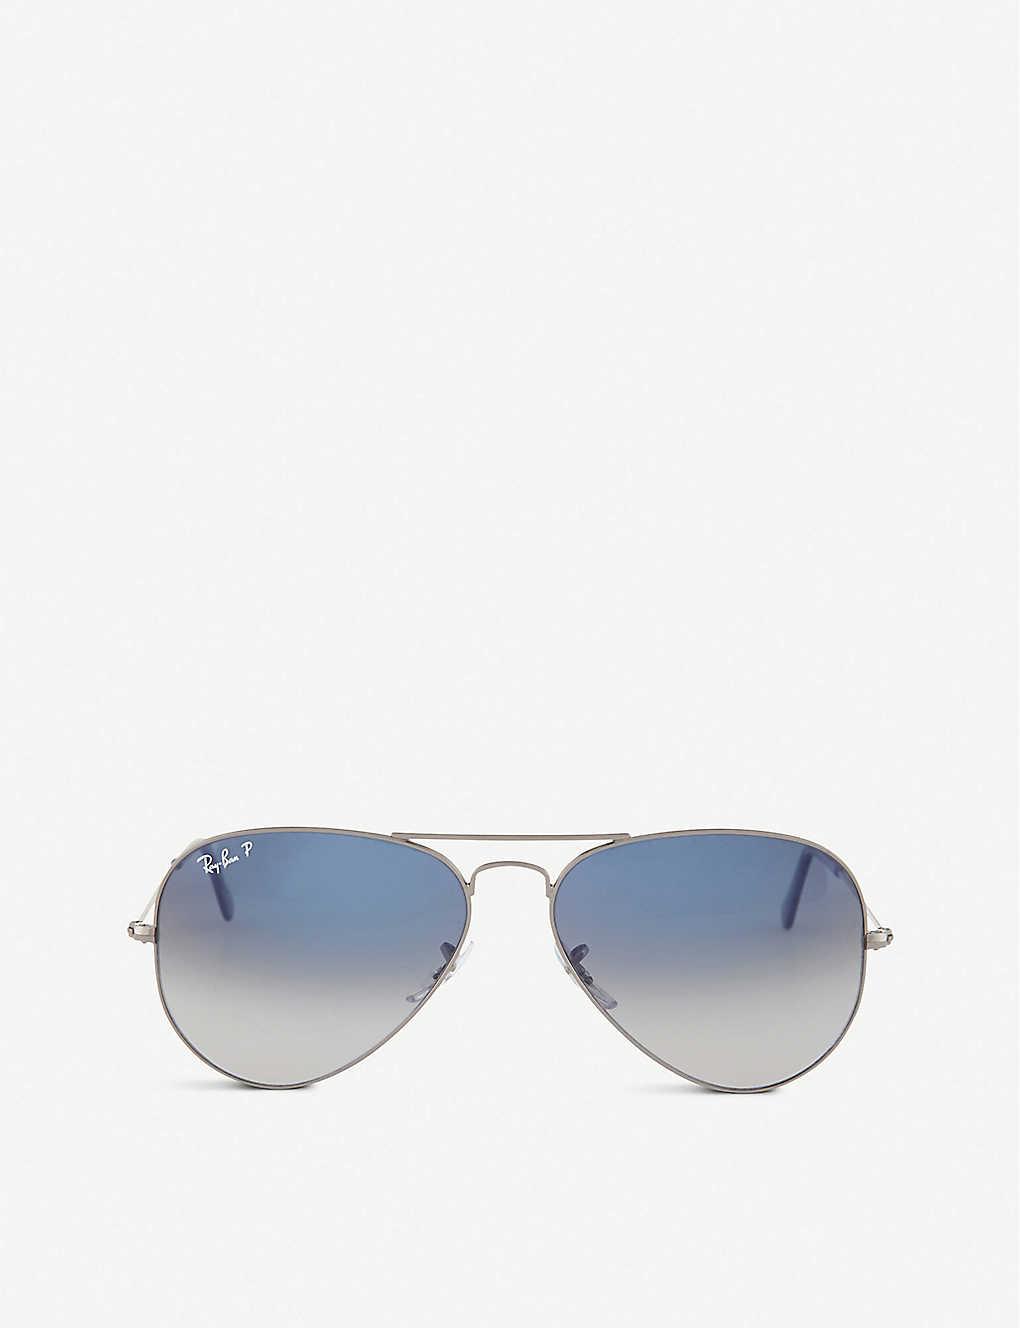 046e372960 RAY-BAN Original aviator gunmetal-frame sunglasses with gradient blue  lenses RB3025 58